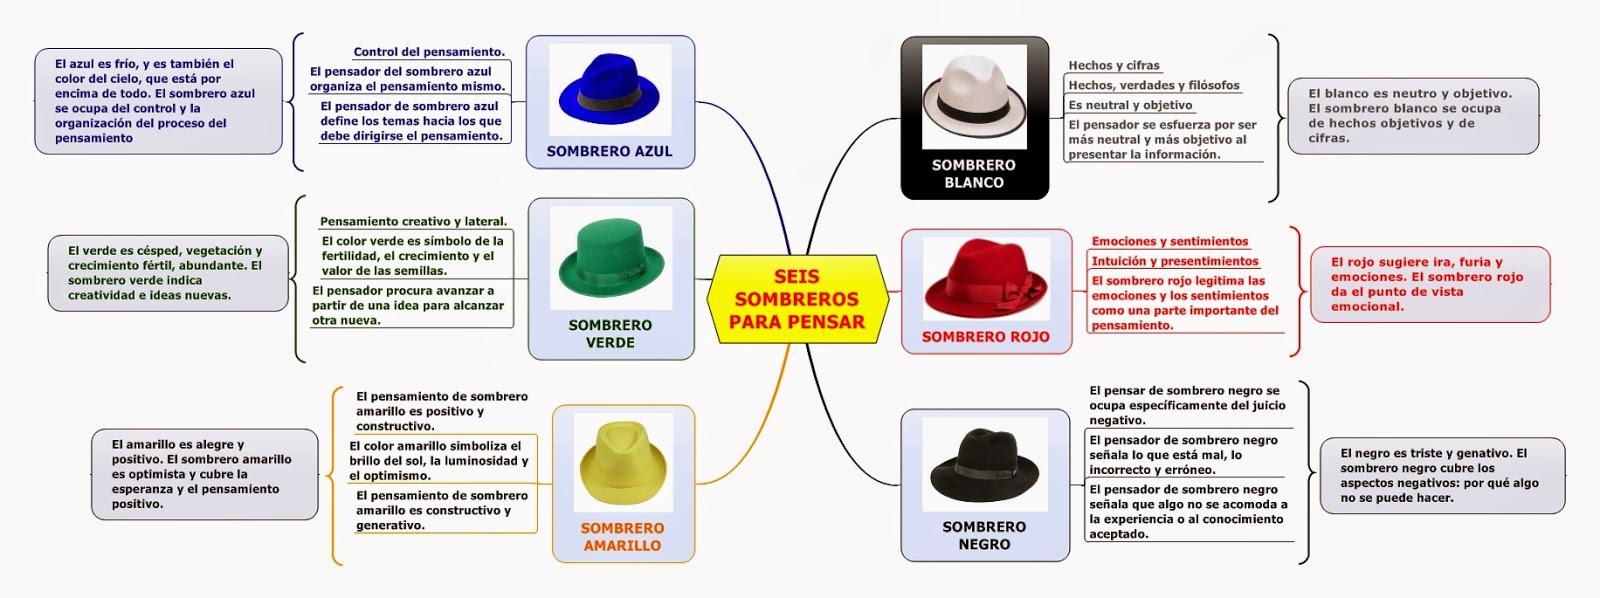 2ed2181d8c033 Los seis sombreros para pensar – mediacionartistica